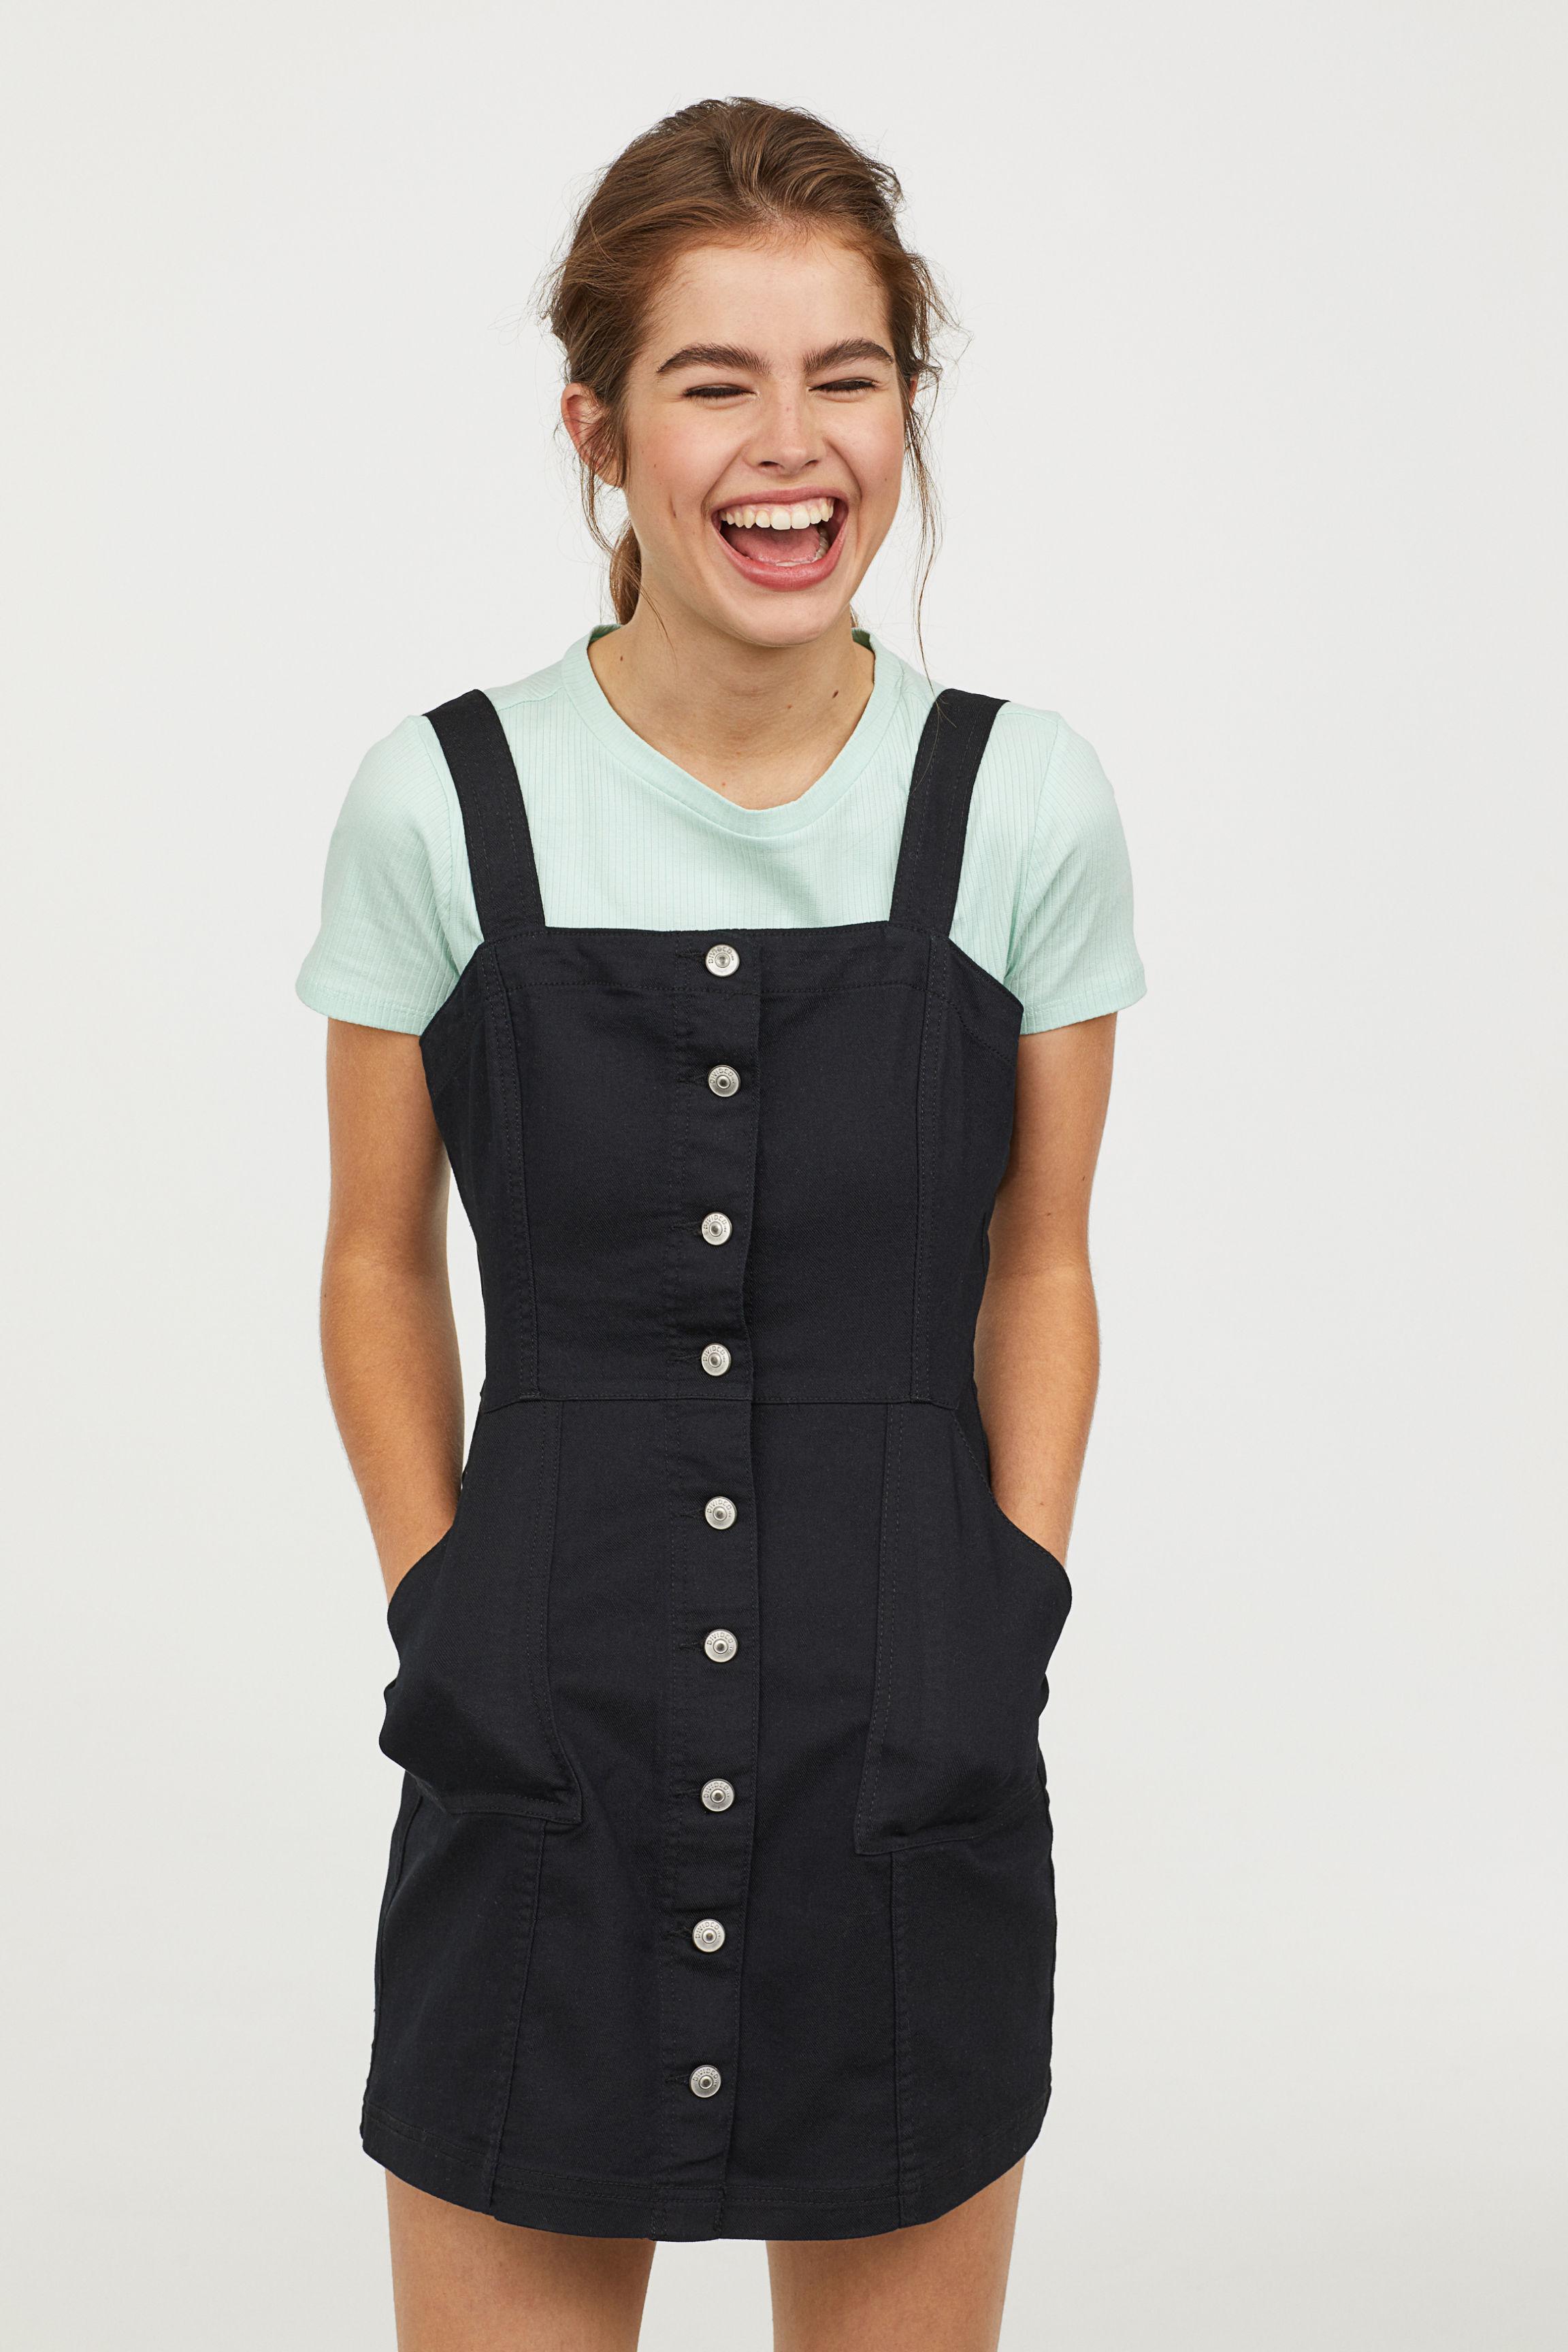 4d7f2d104ba9 Black Denim Pinafore Dress H M - Photo Dress Wallpaper HD AOrg